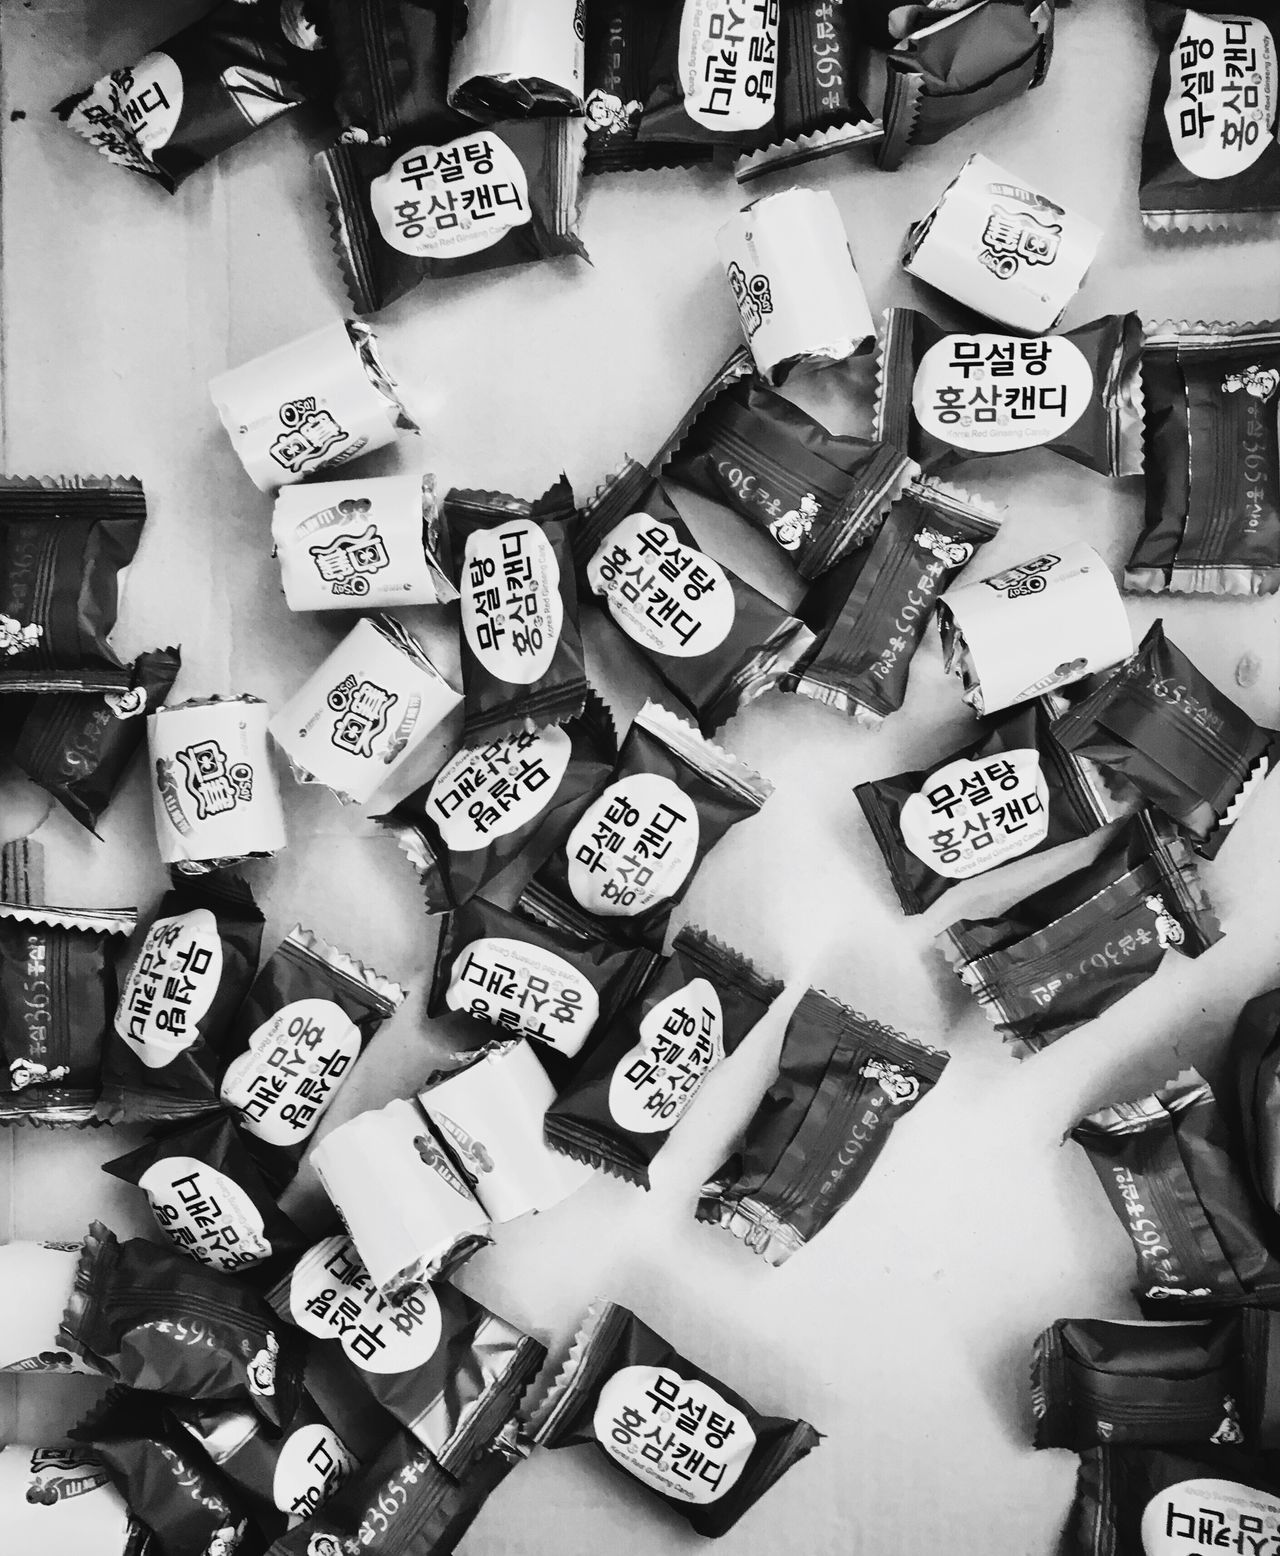 korean candys Large Group Of Objects No People Korean Food Korea Candy Ginseng Blackandwhite Blackandwhite Photography Black White